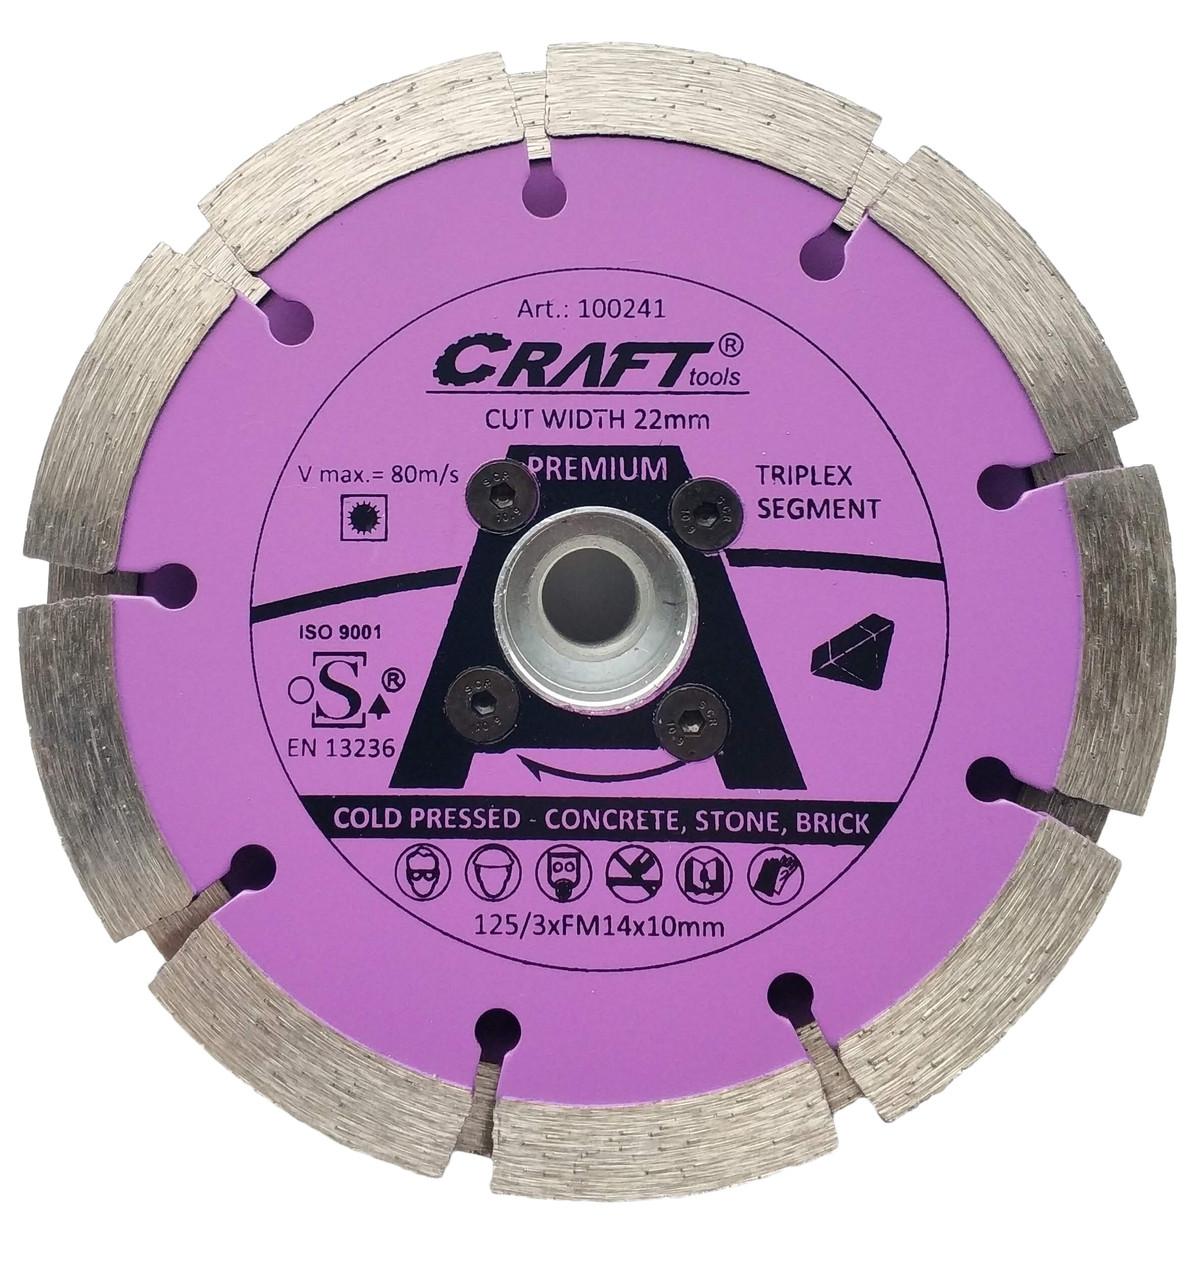 241 Диск Сraft алм. segment cutter  125/3*M14*2*10 мм. Штроборіз (3 диска)